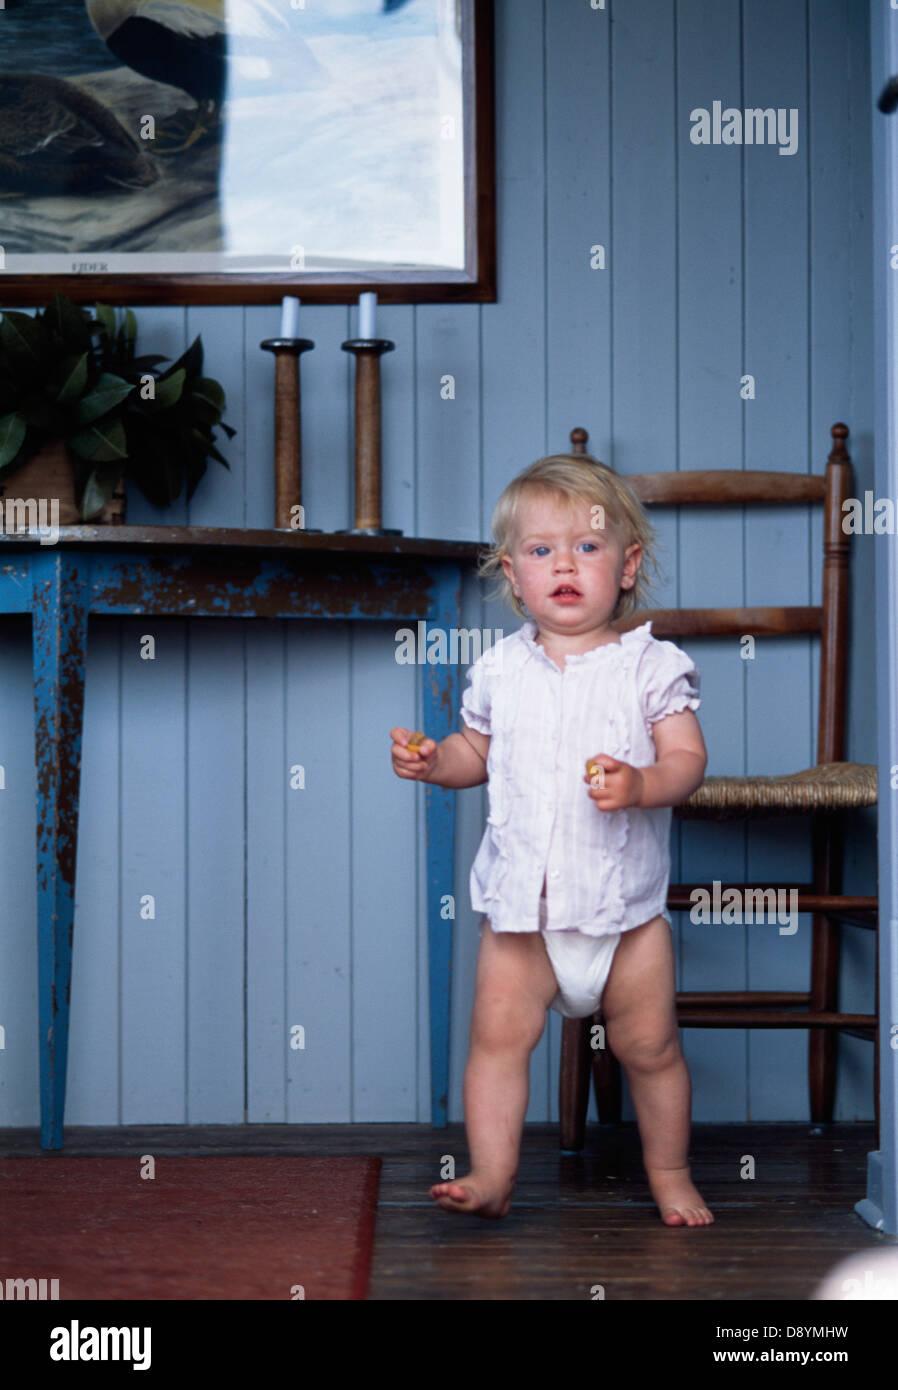 Baby girl wearing diaper Stock Photo: 57157237 - Alamy